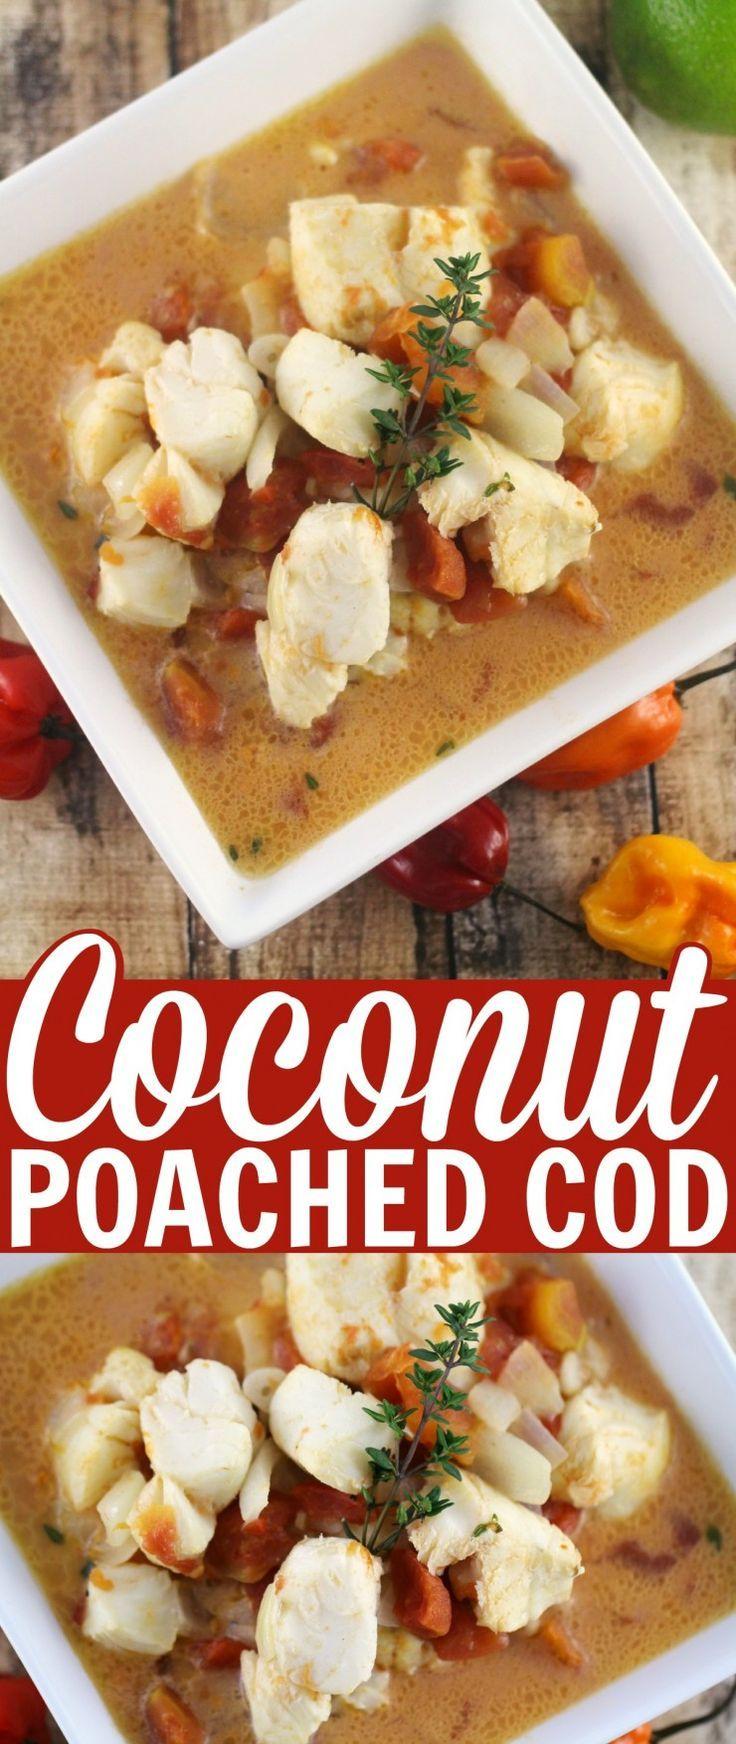 Coconut poached cod recipe coconut milk coconut and recipes coconut poached cod forumfinder Choice Image